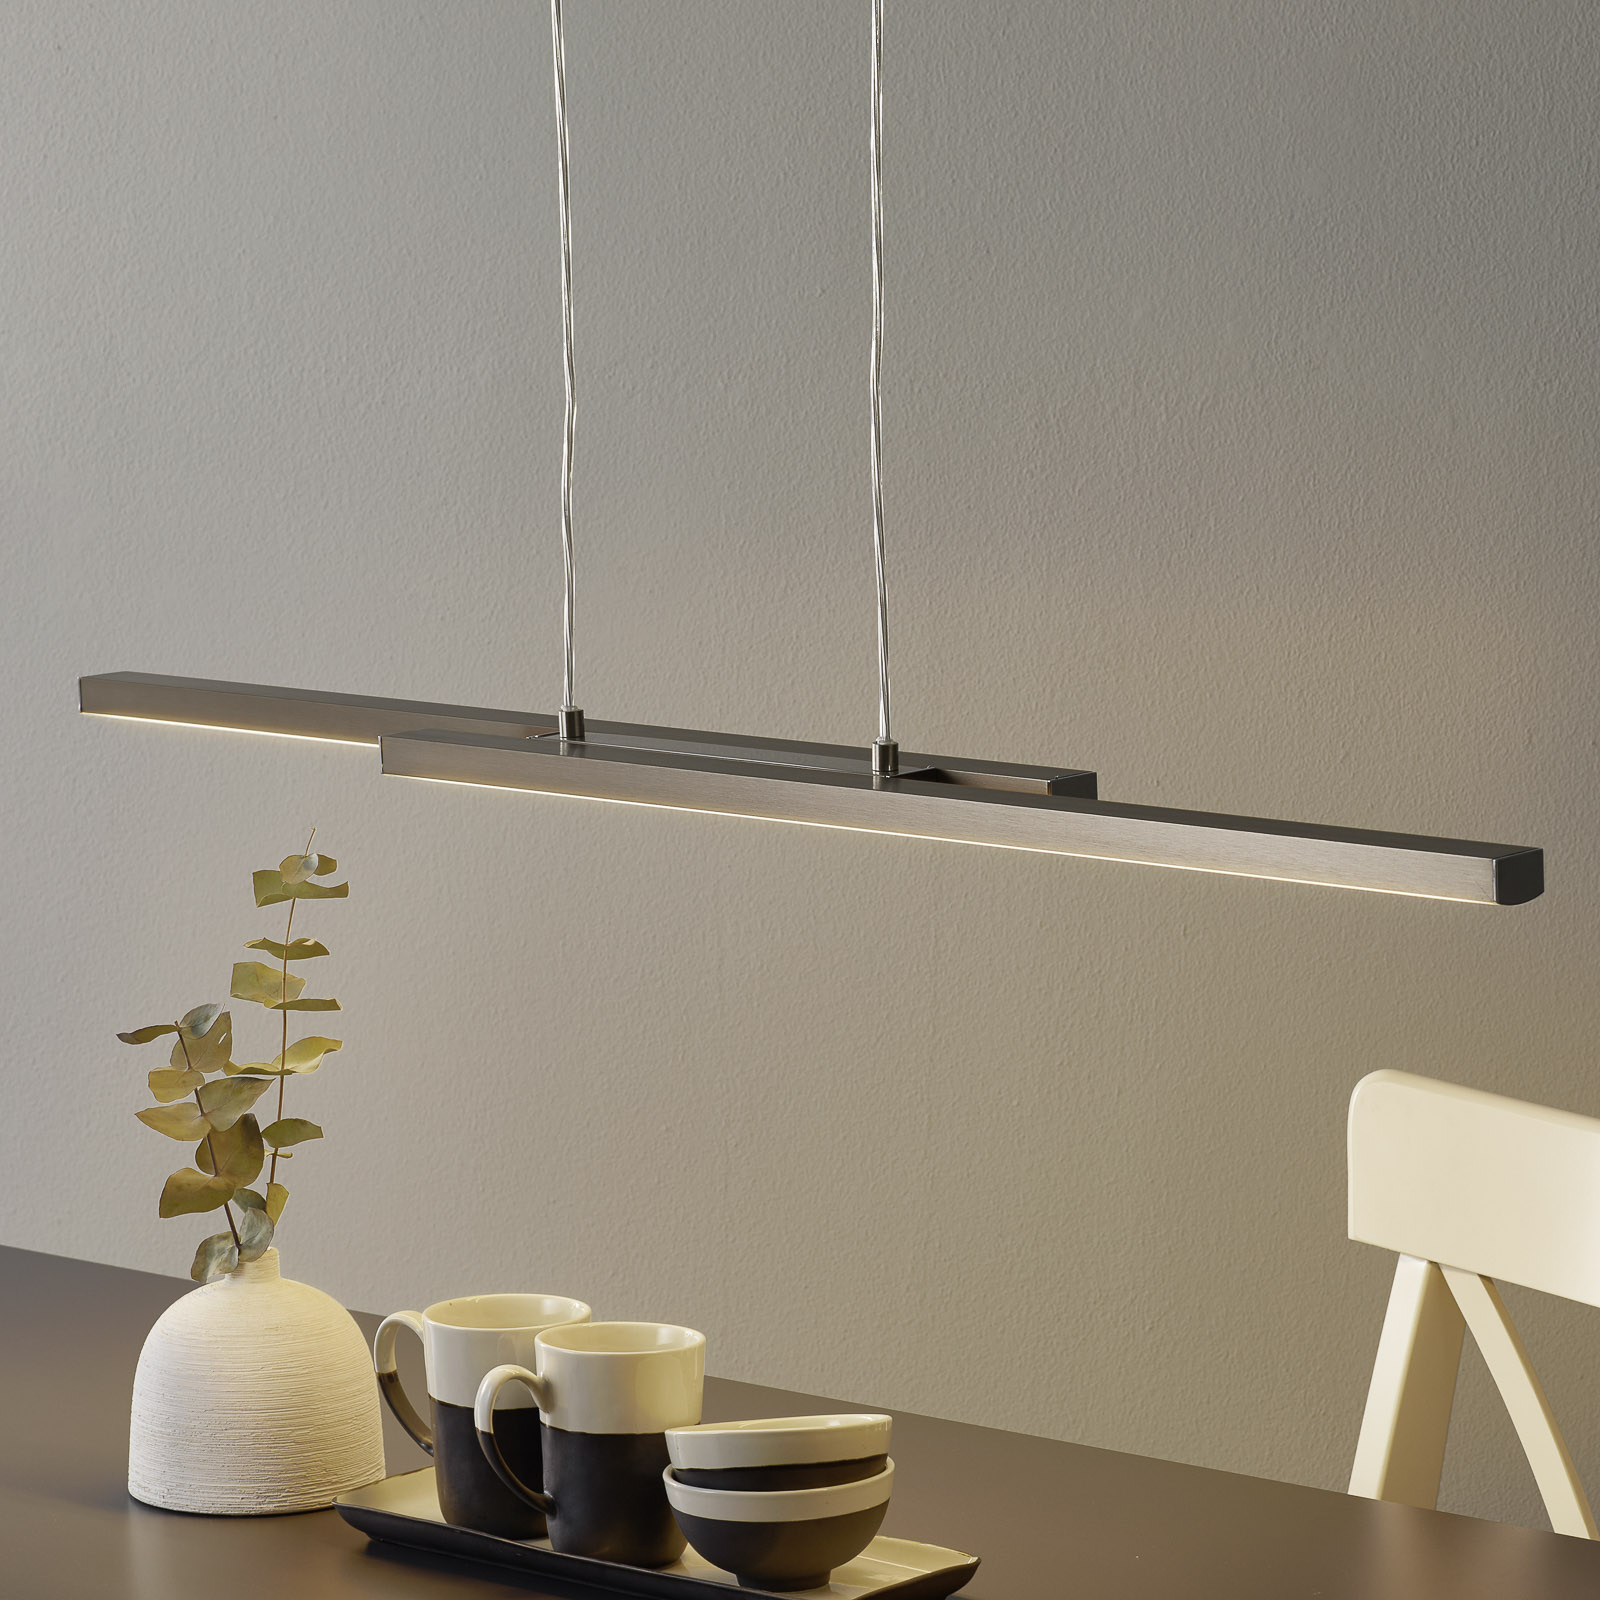 EGLO connect Fraioli-C LED-hengelampe, rettformet